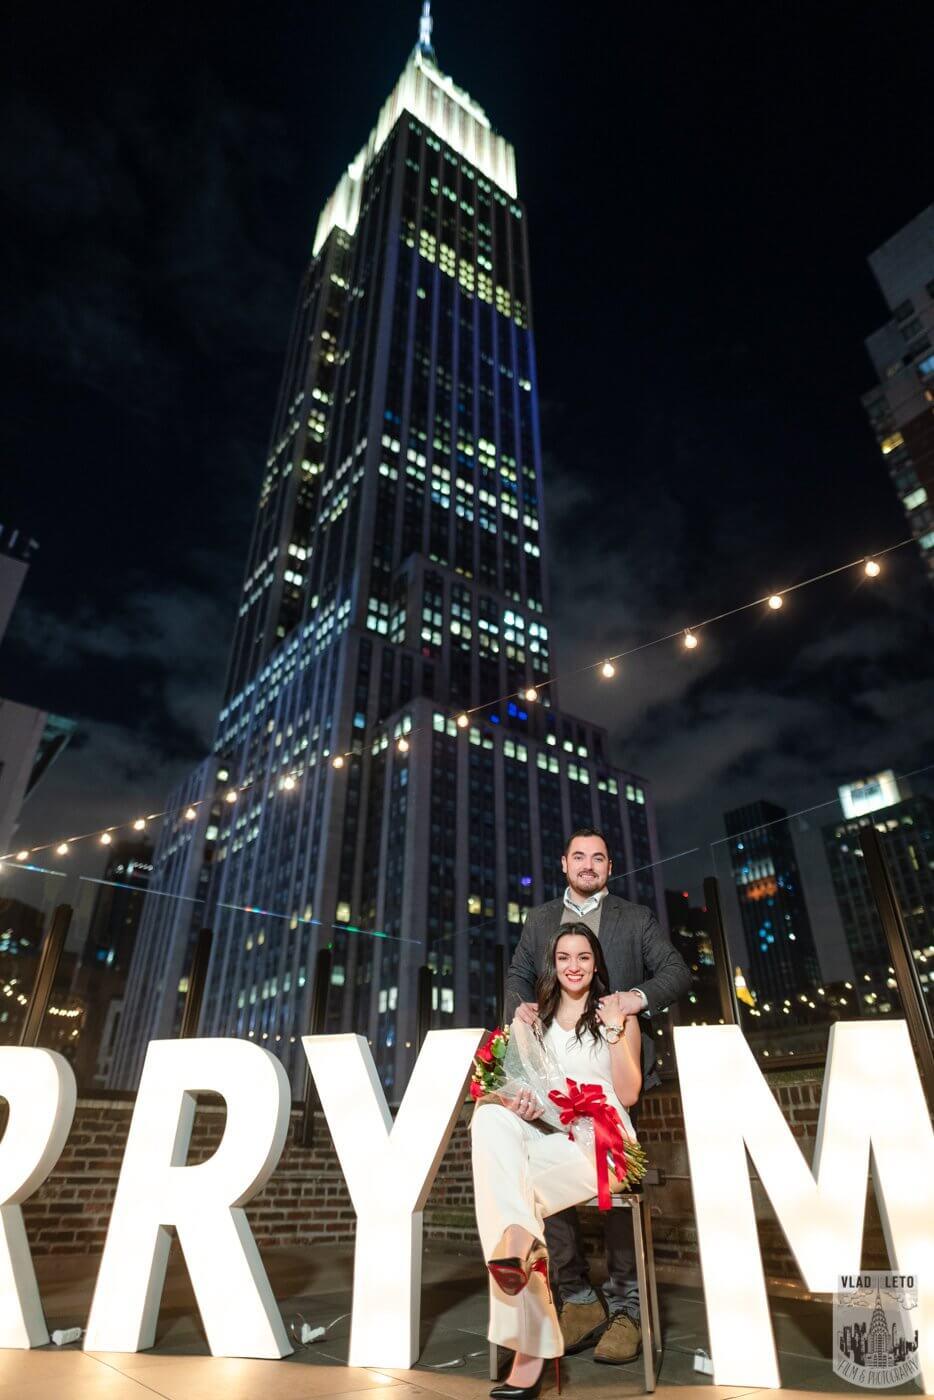 Photo 5 Gigantic Marry Me Letters Rooftop Proposal | VladLeto